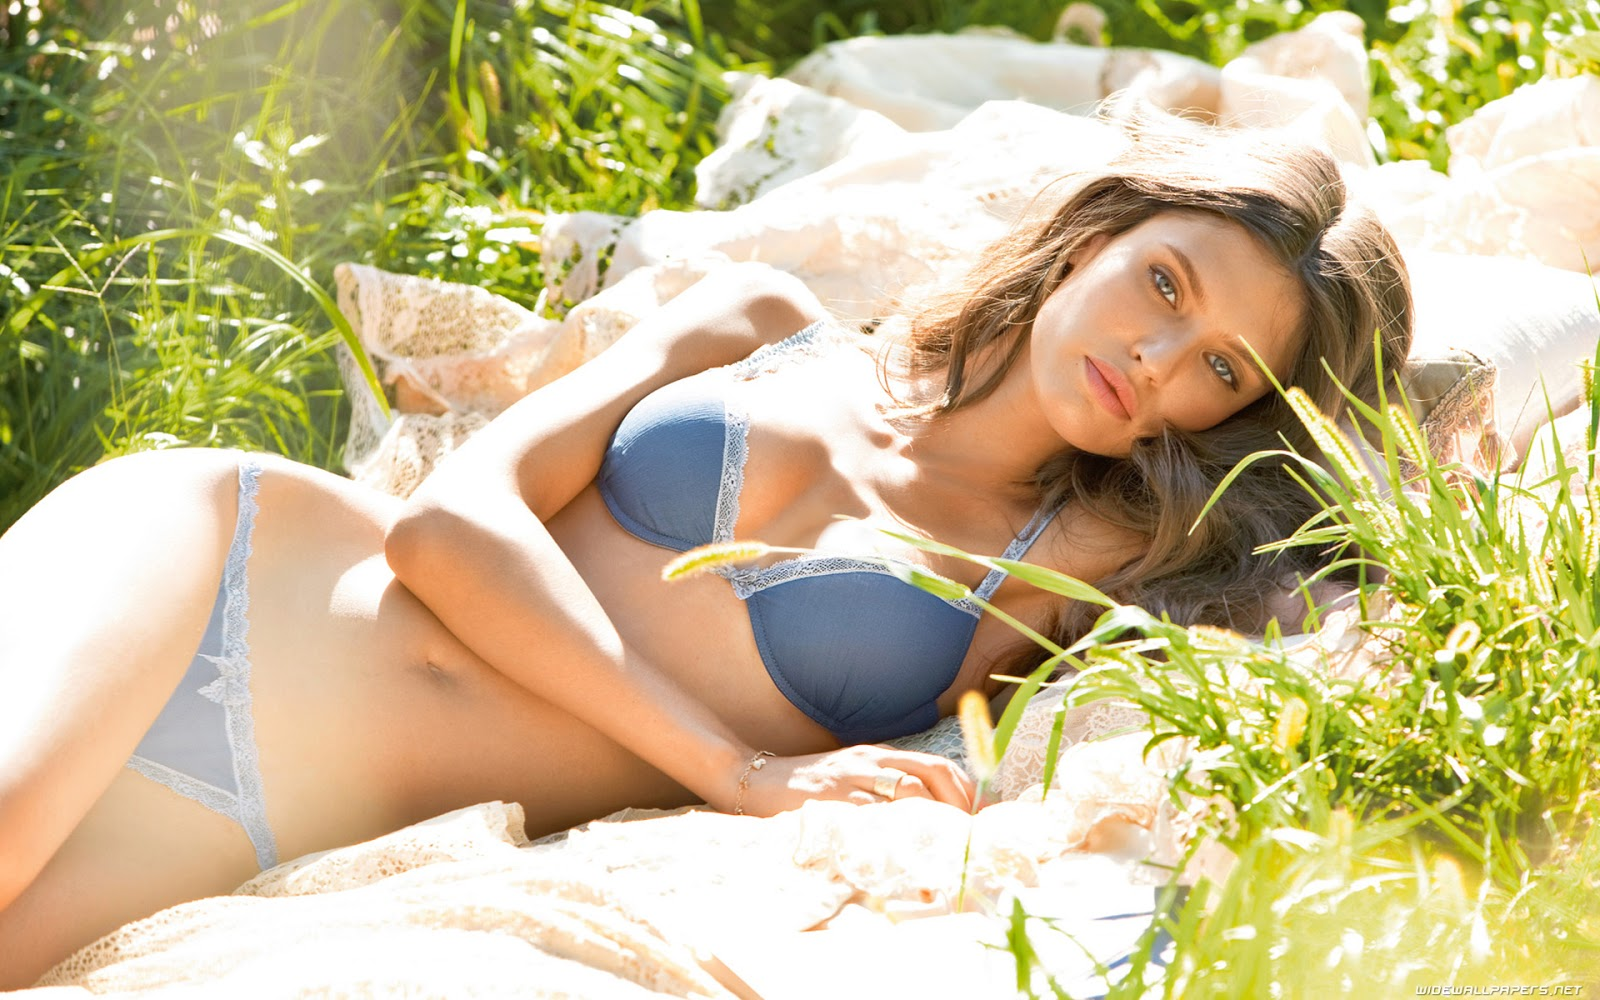 Celebrities in Hot Bikini: Bianca Balti